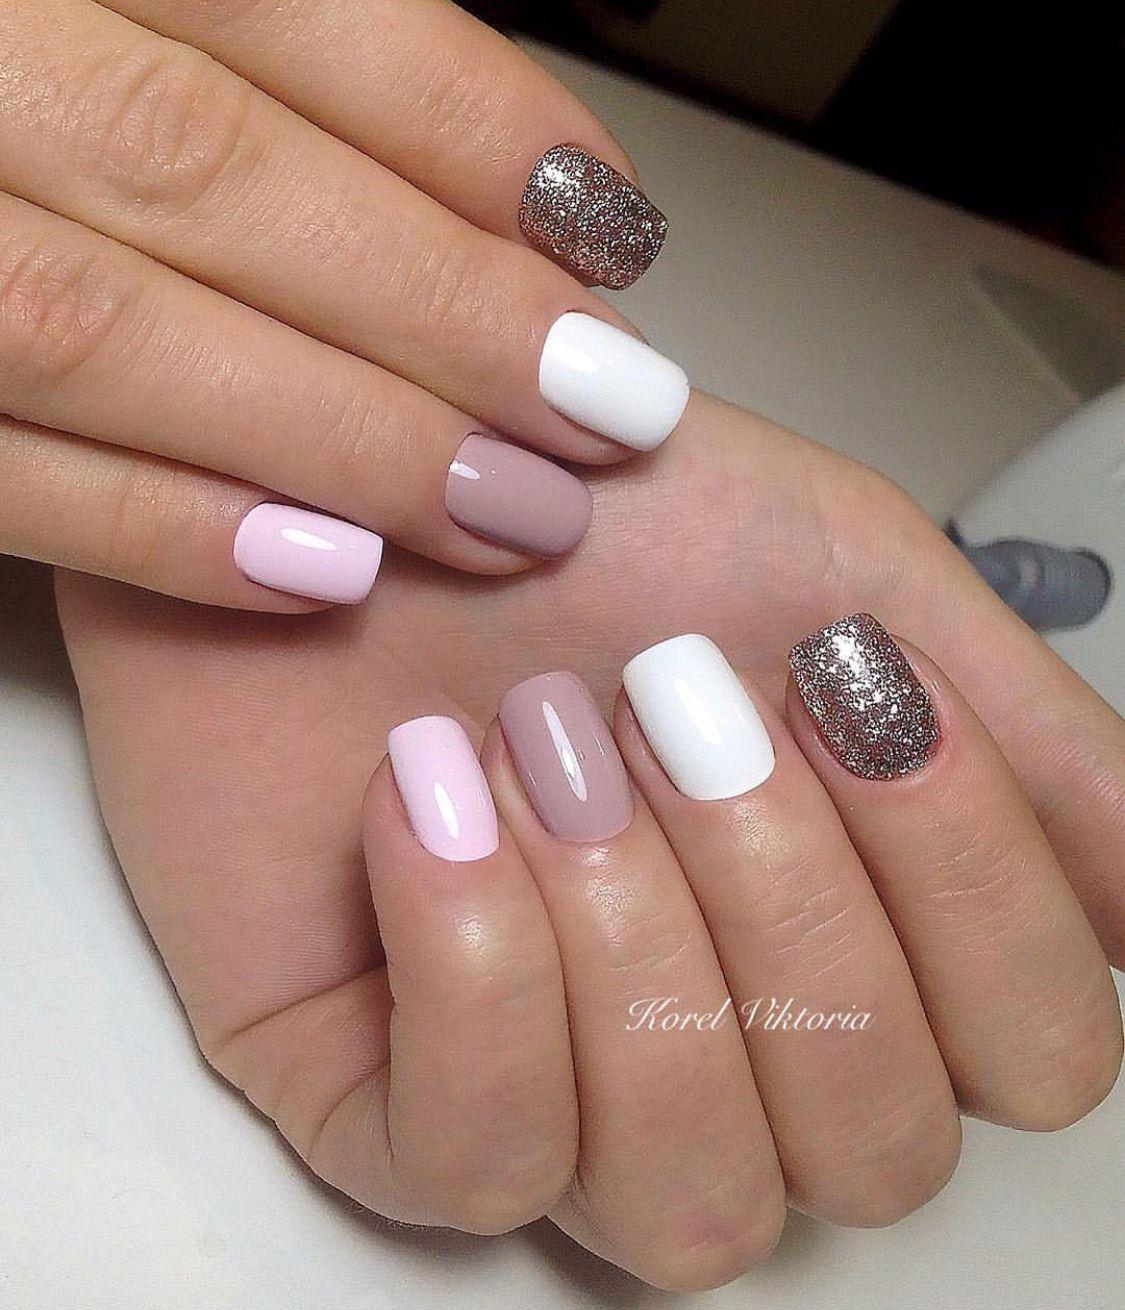 Cute colors for shellac nails | Hair&Nails | Pinterest ...